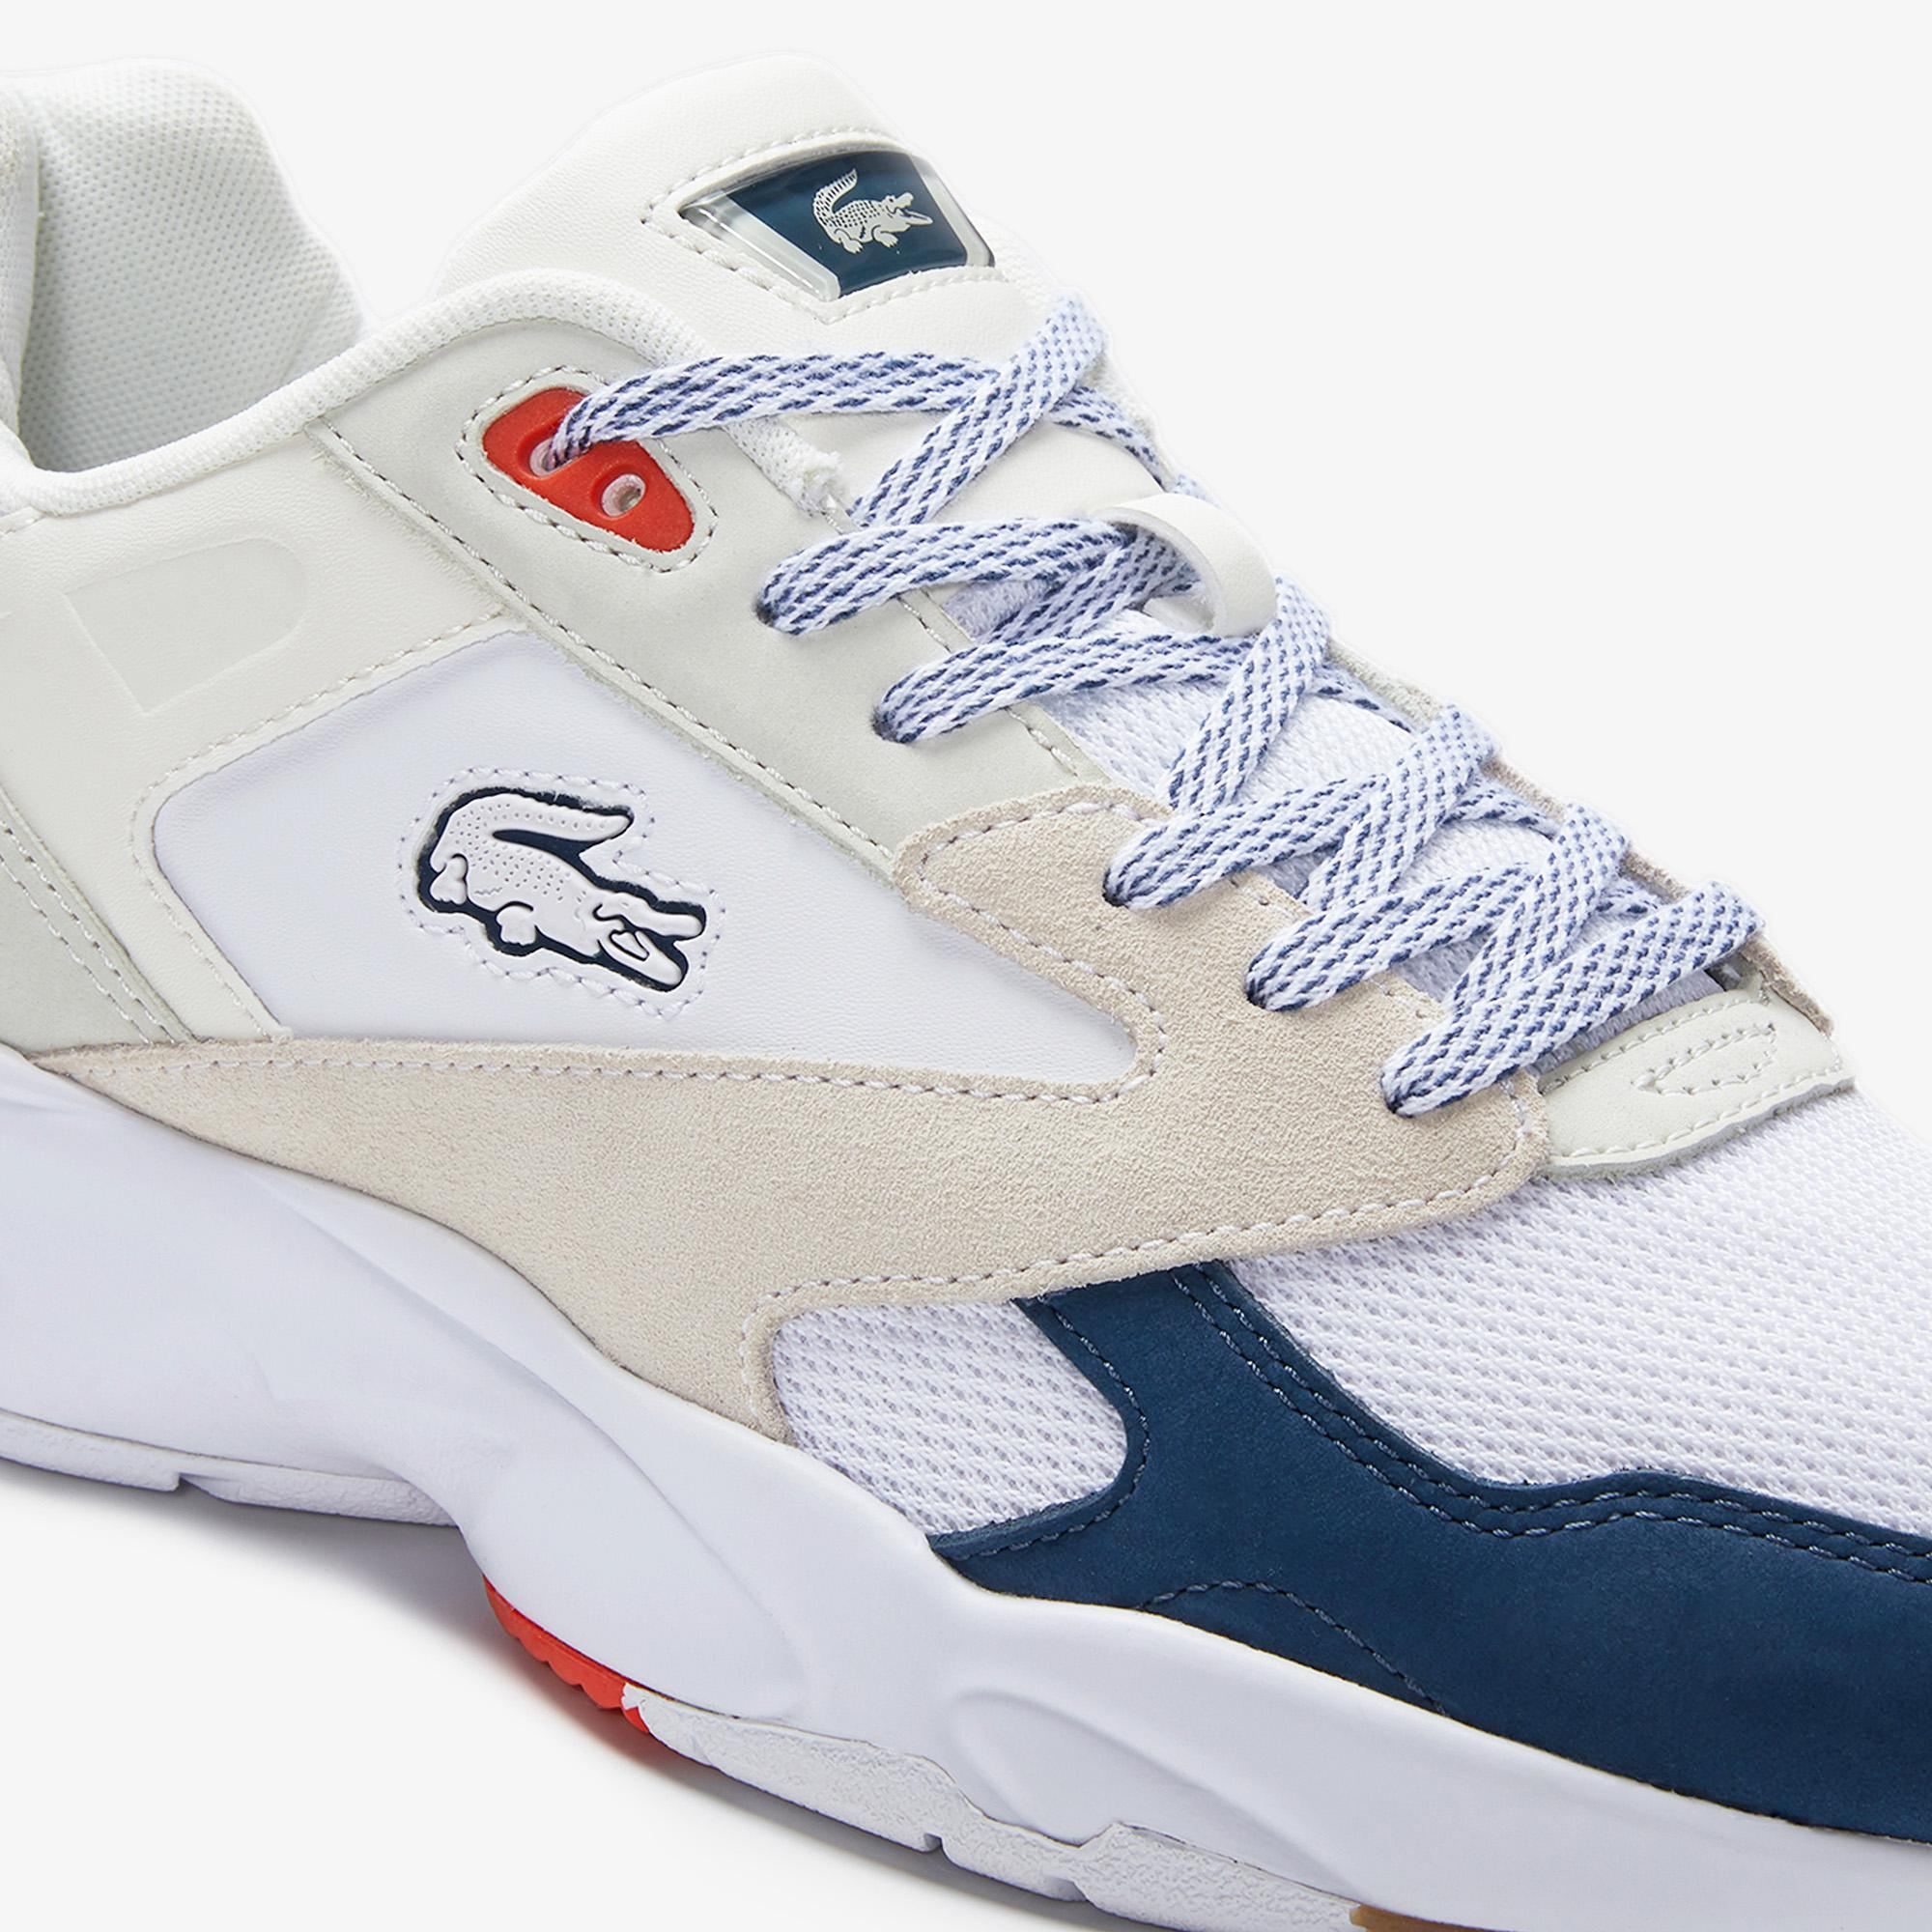 Lacoste Storm 96 Lo 0120 4 Sma Erkek Beyaz - Koyu Mavi Sneaker